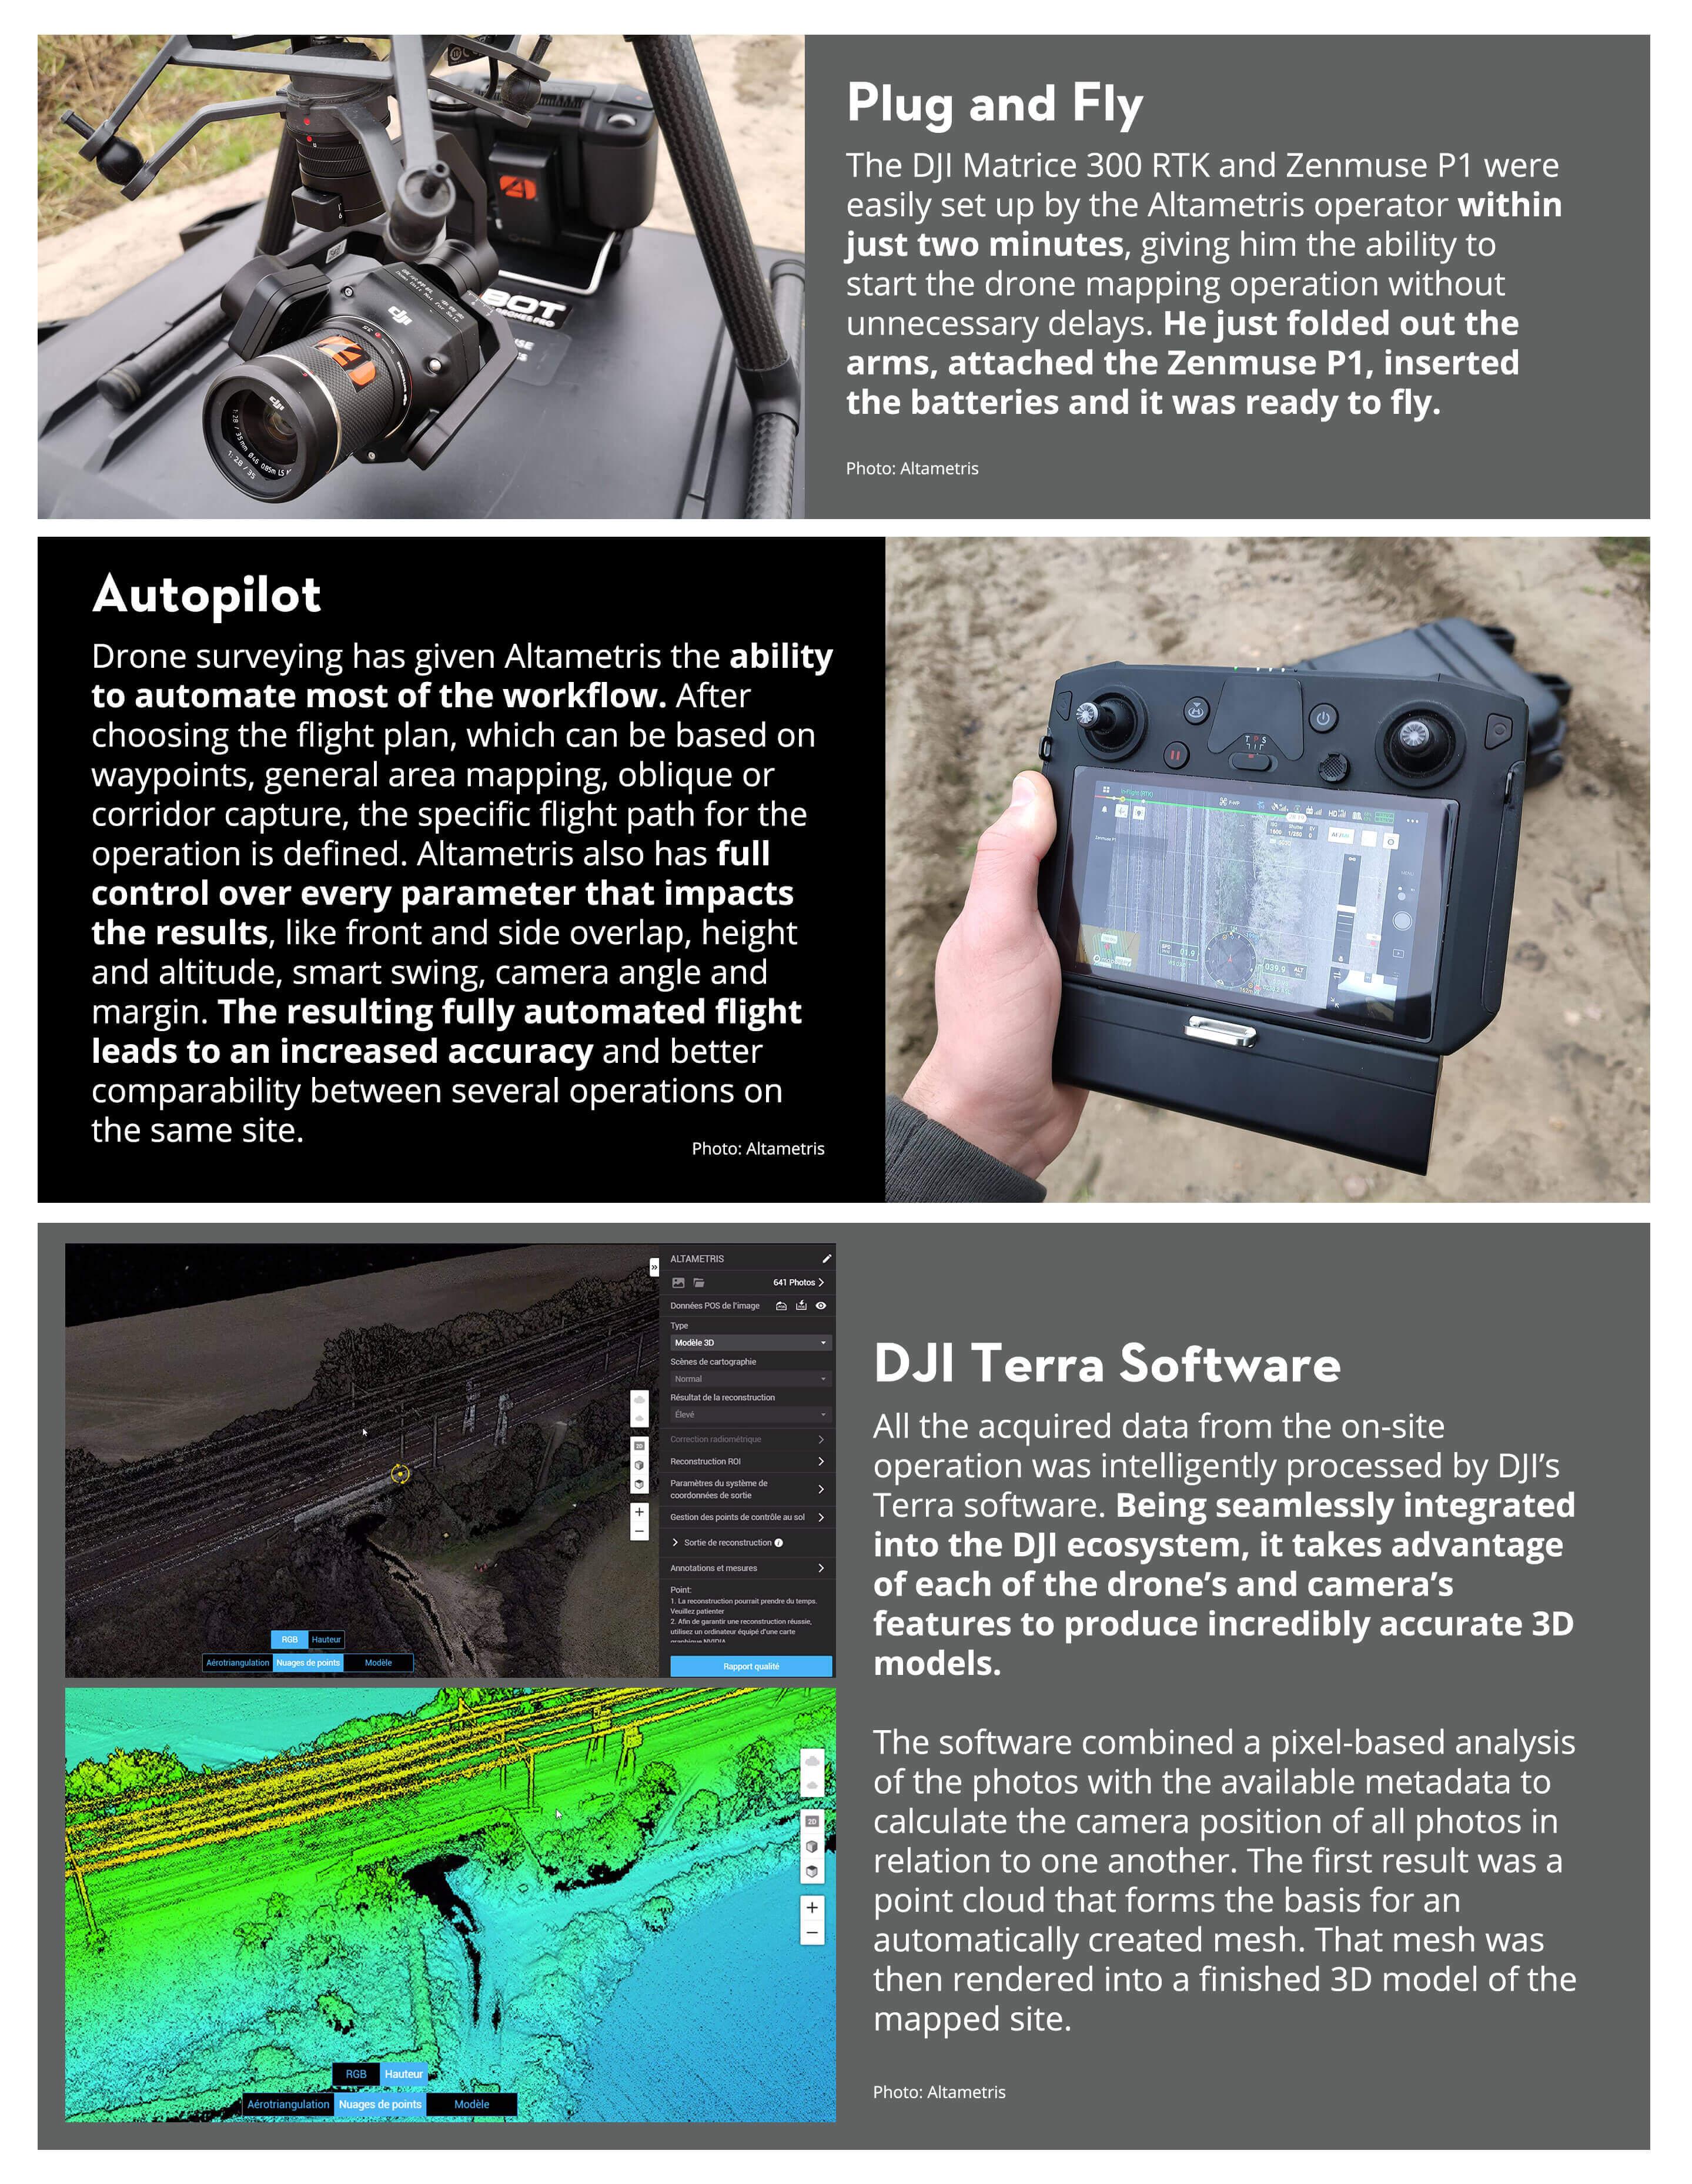 Altametris DJI Infographic 2